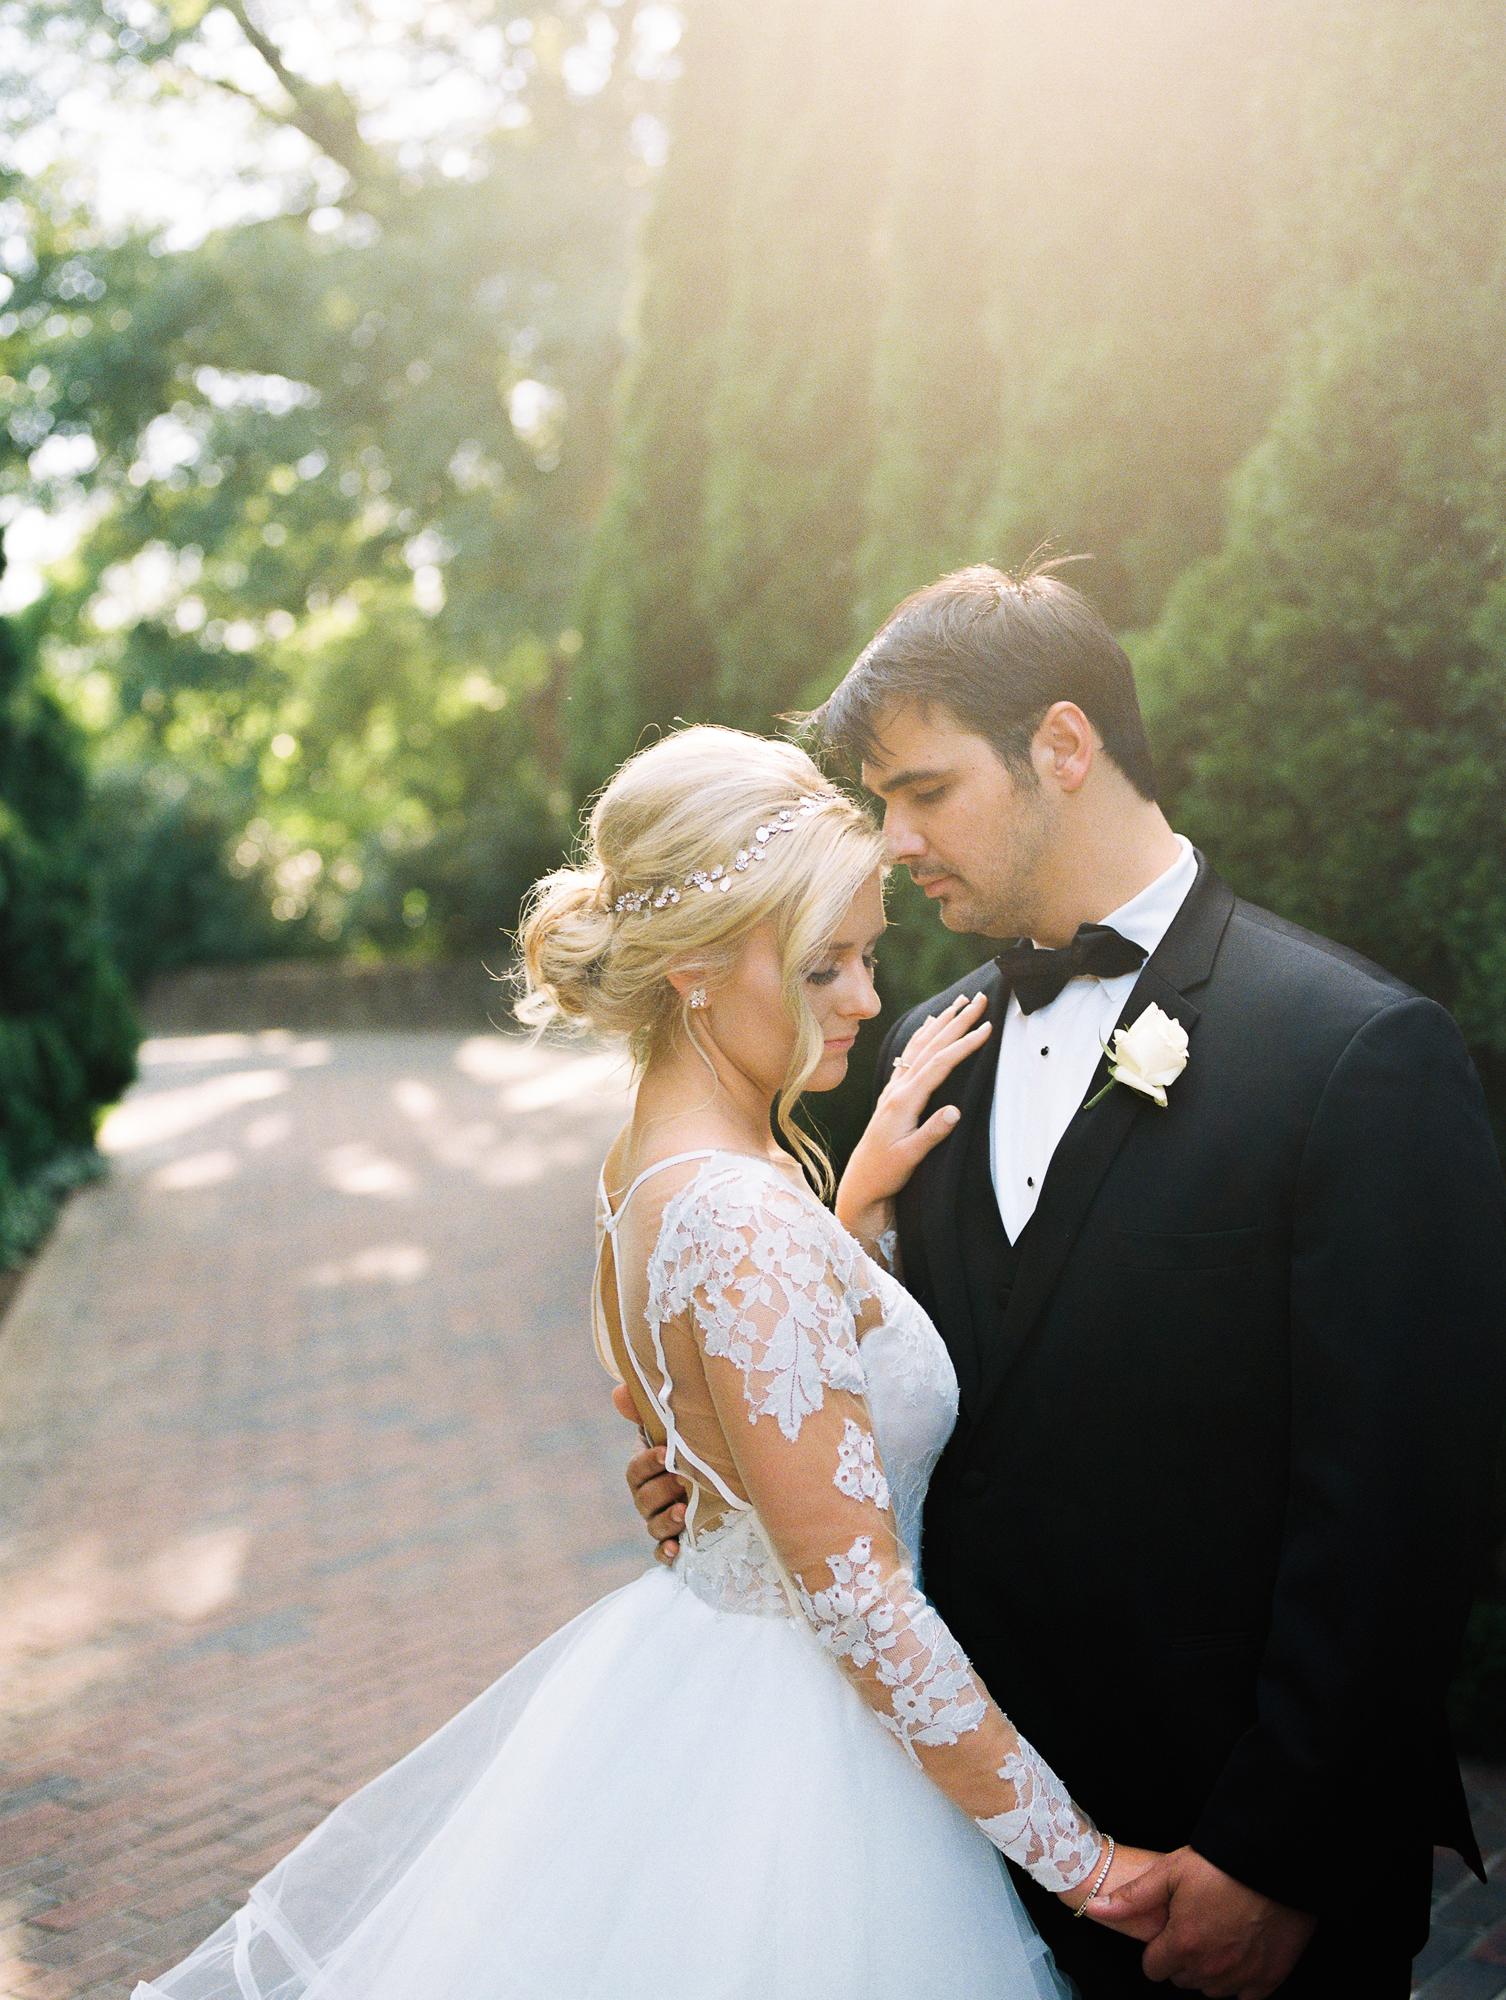 Colleen and Patrick - Crescent Club Wedding  - Memphis, TN - © Kaitlyn Stoddard-Carter-5.jpg